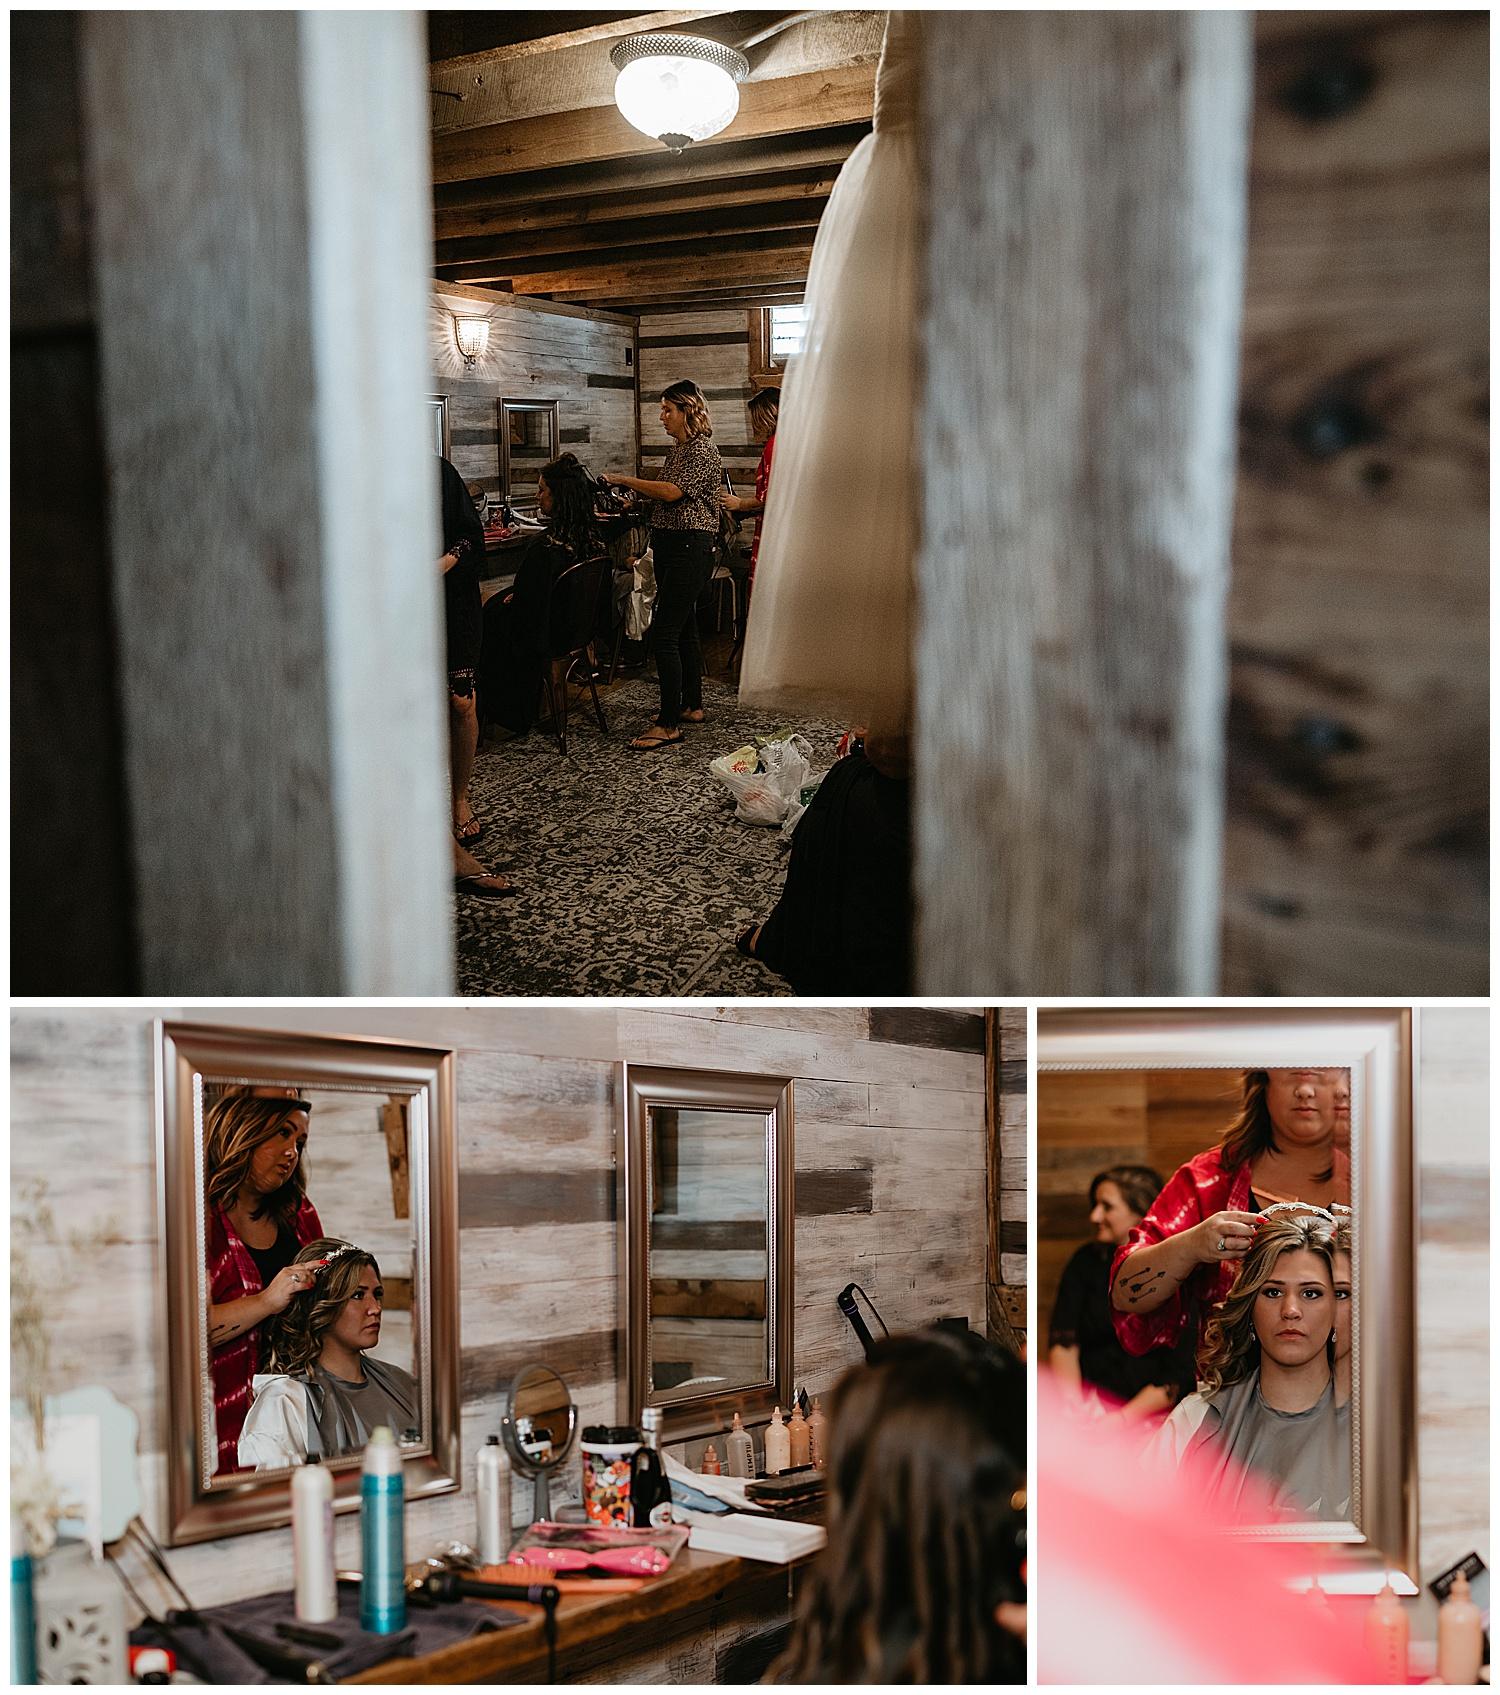 NEPA-Bloomgsburg-Wedding-Photographer-at-The-Barn-at-Greystone-Farms-Watsontown-PA_0009.jpg